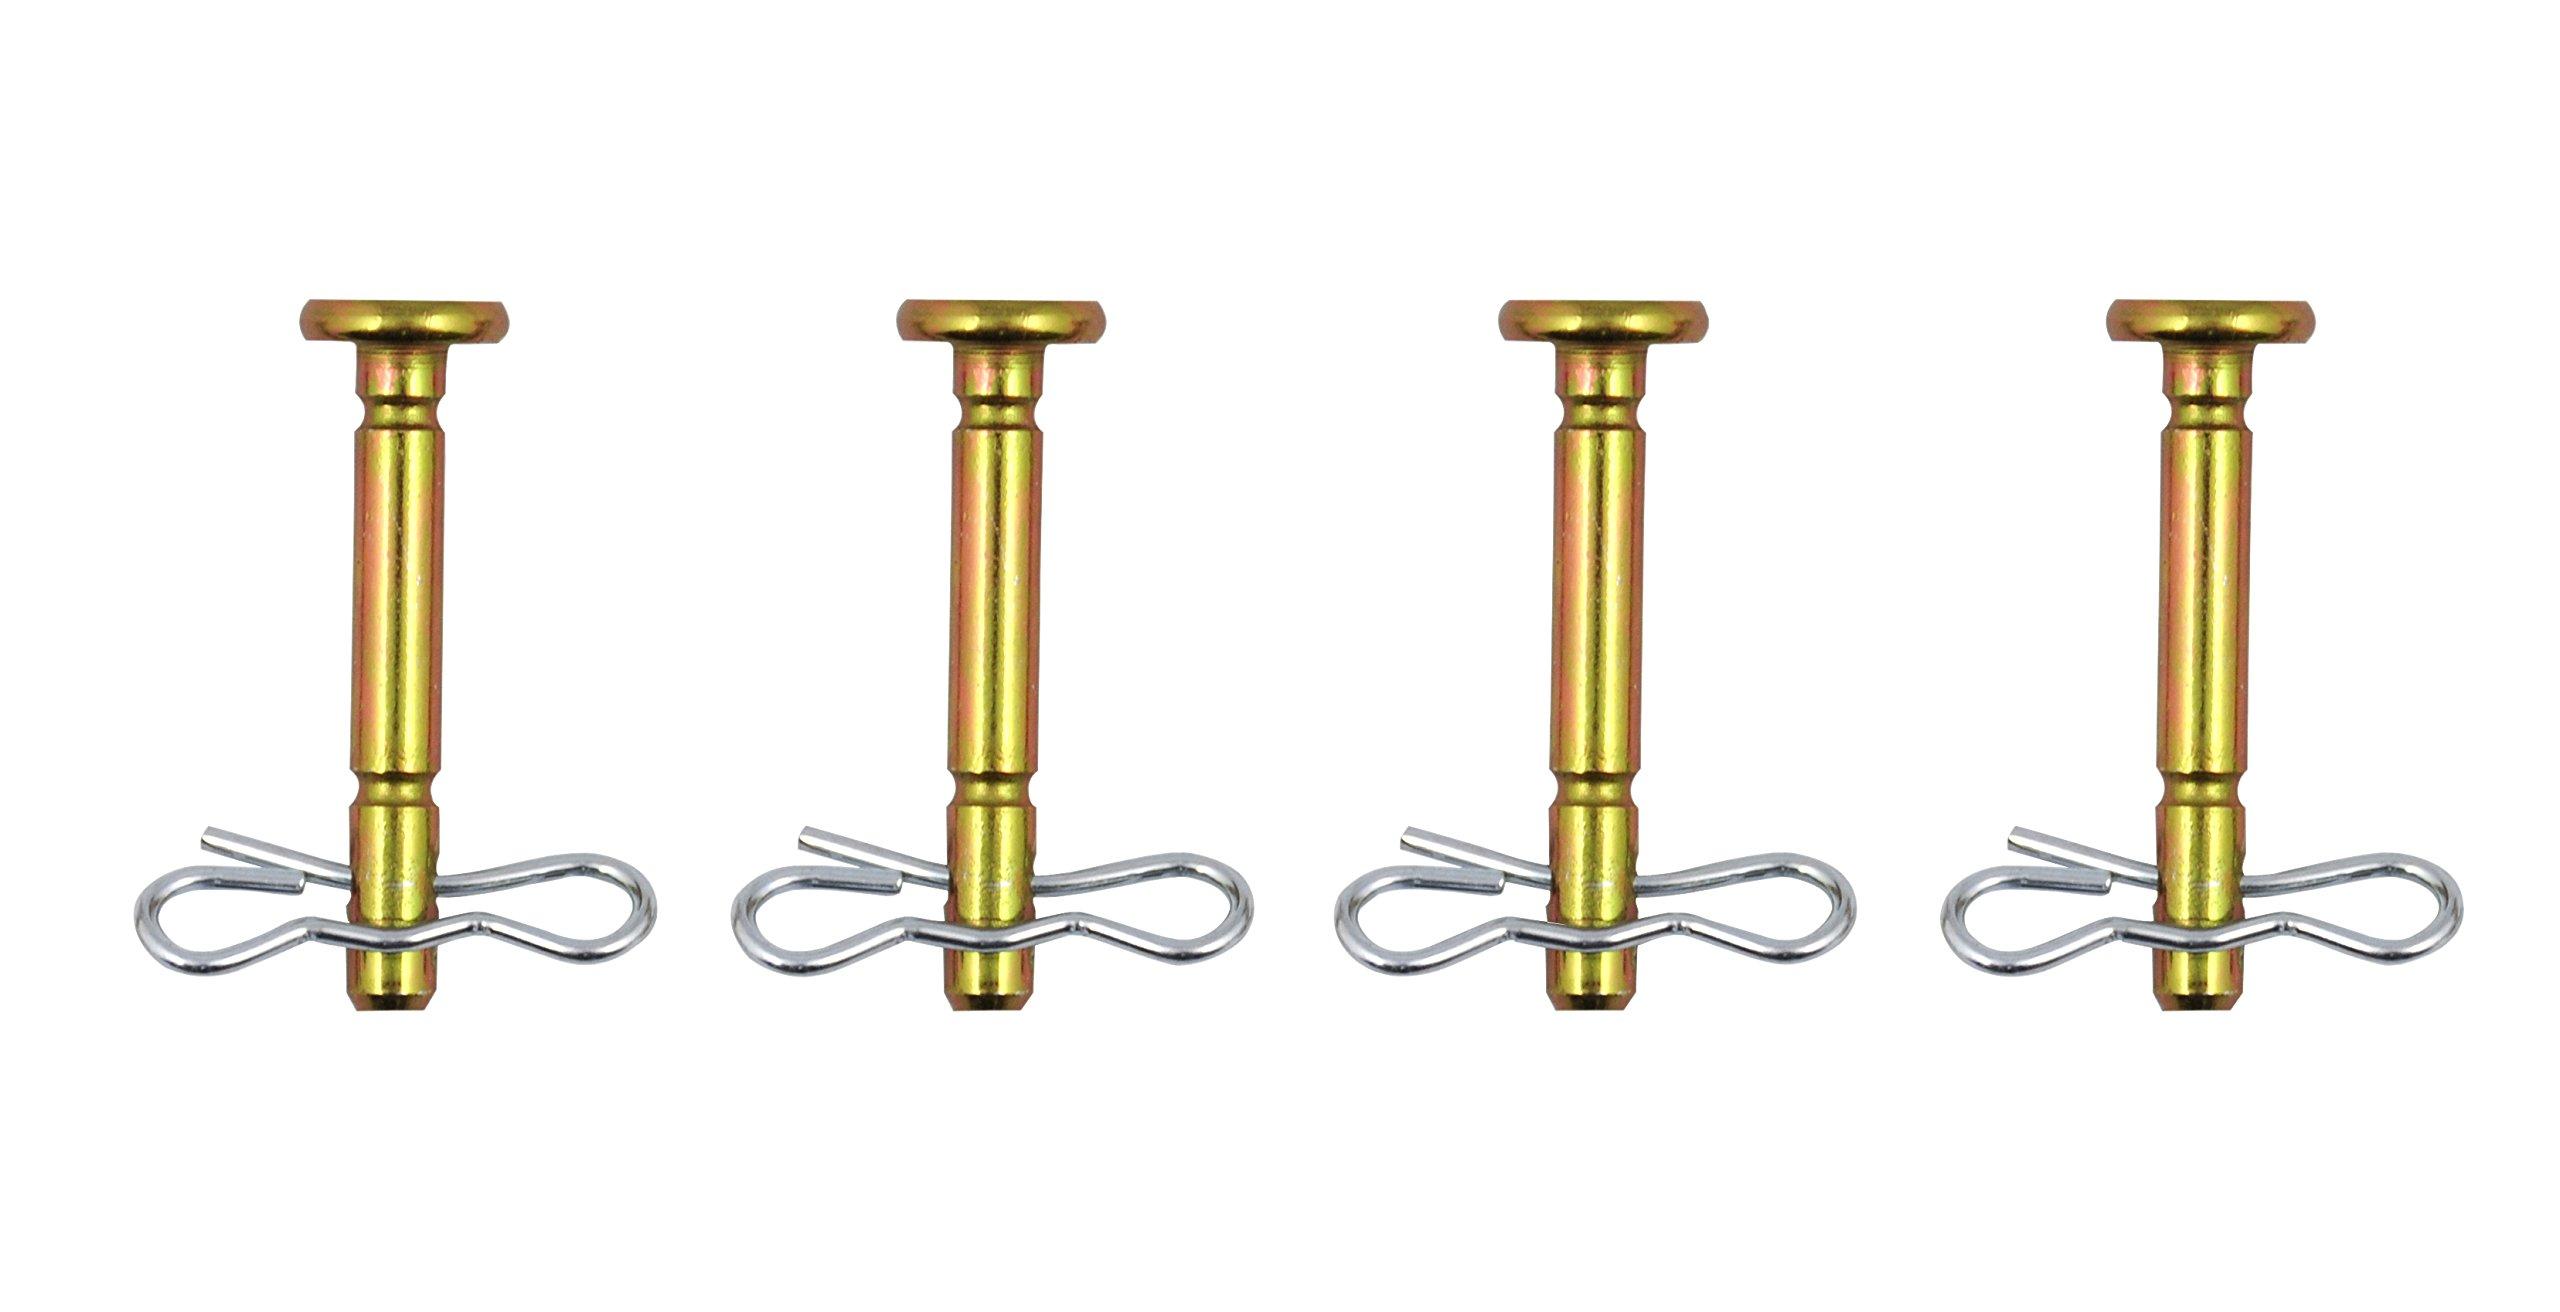 MTD OEM-738-04155 Shear Pin Set product image